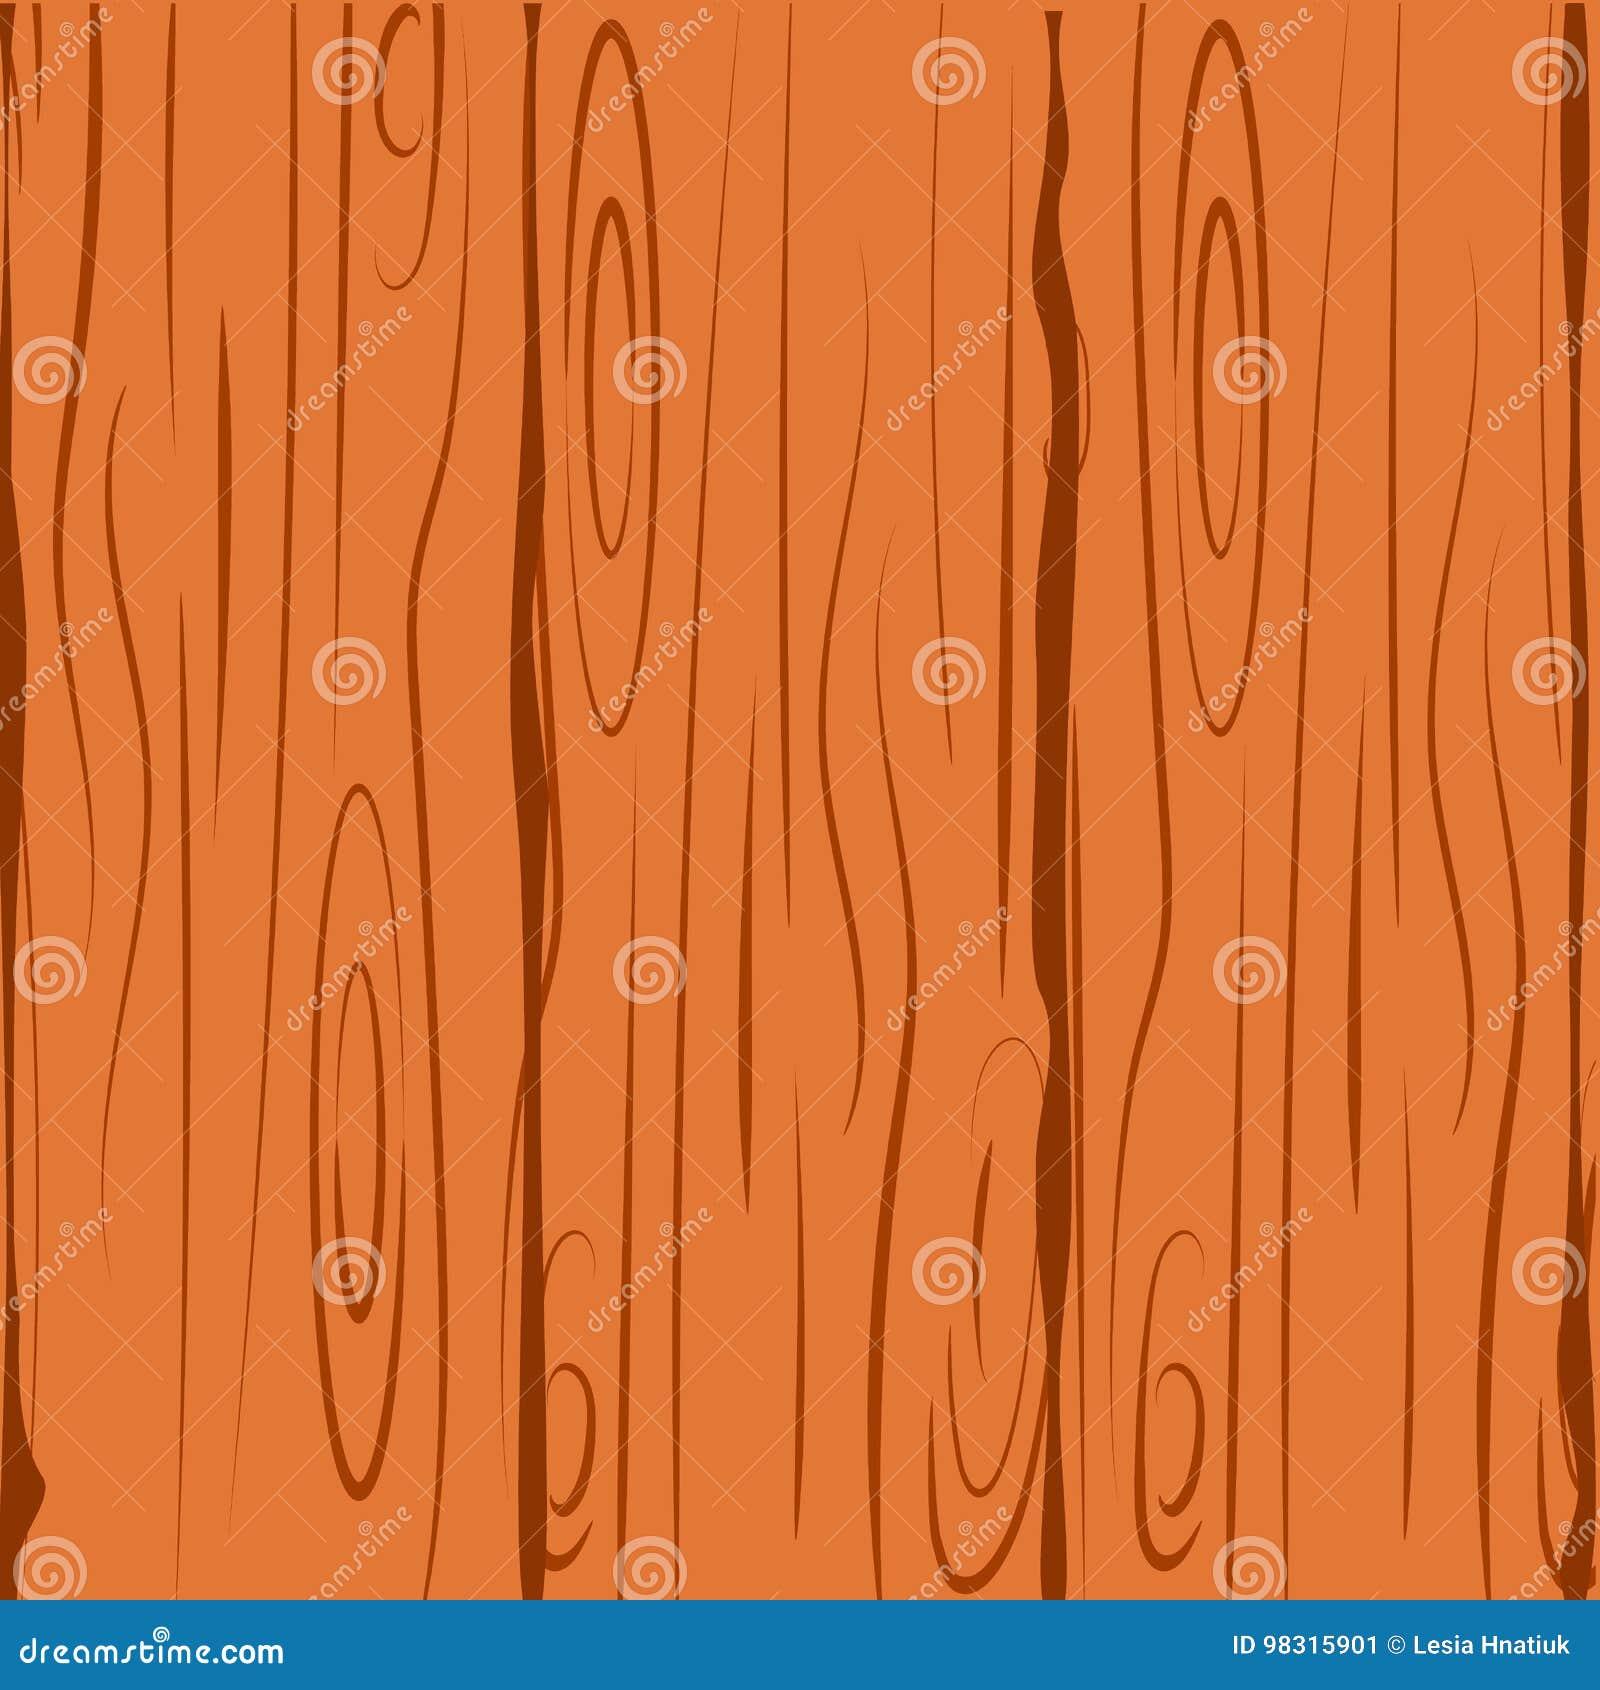 Wood texture vector illustration natural plank floor vintage hardwood retro timber old wall surface